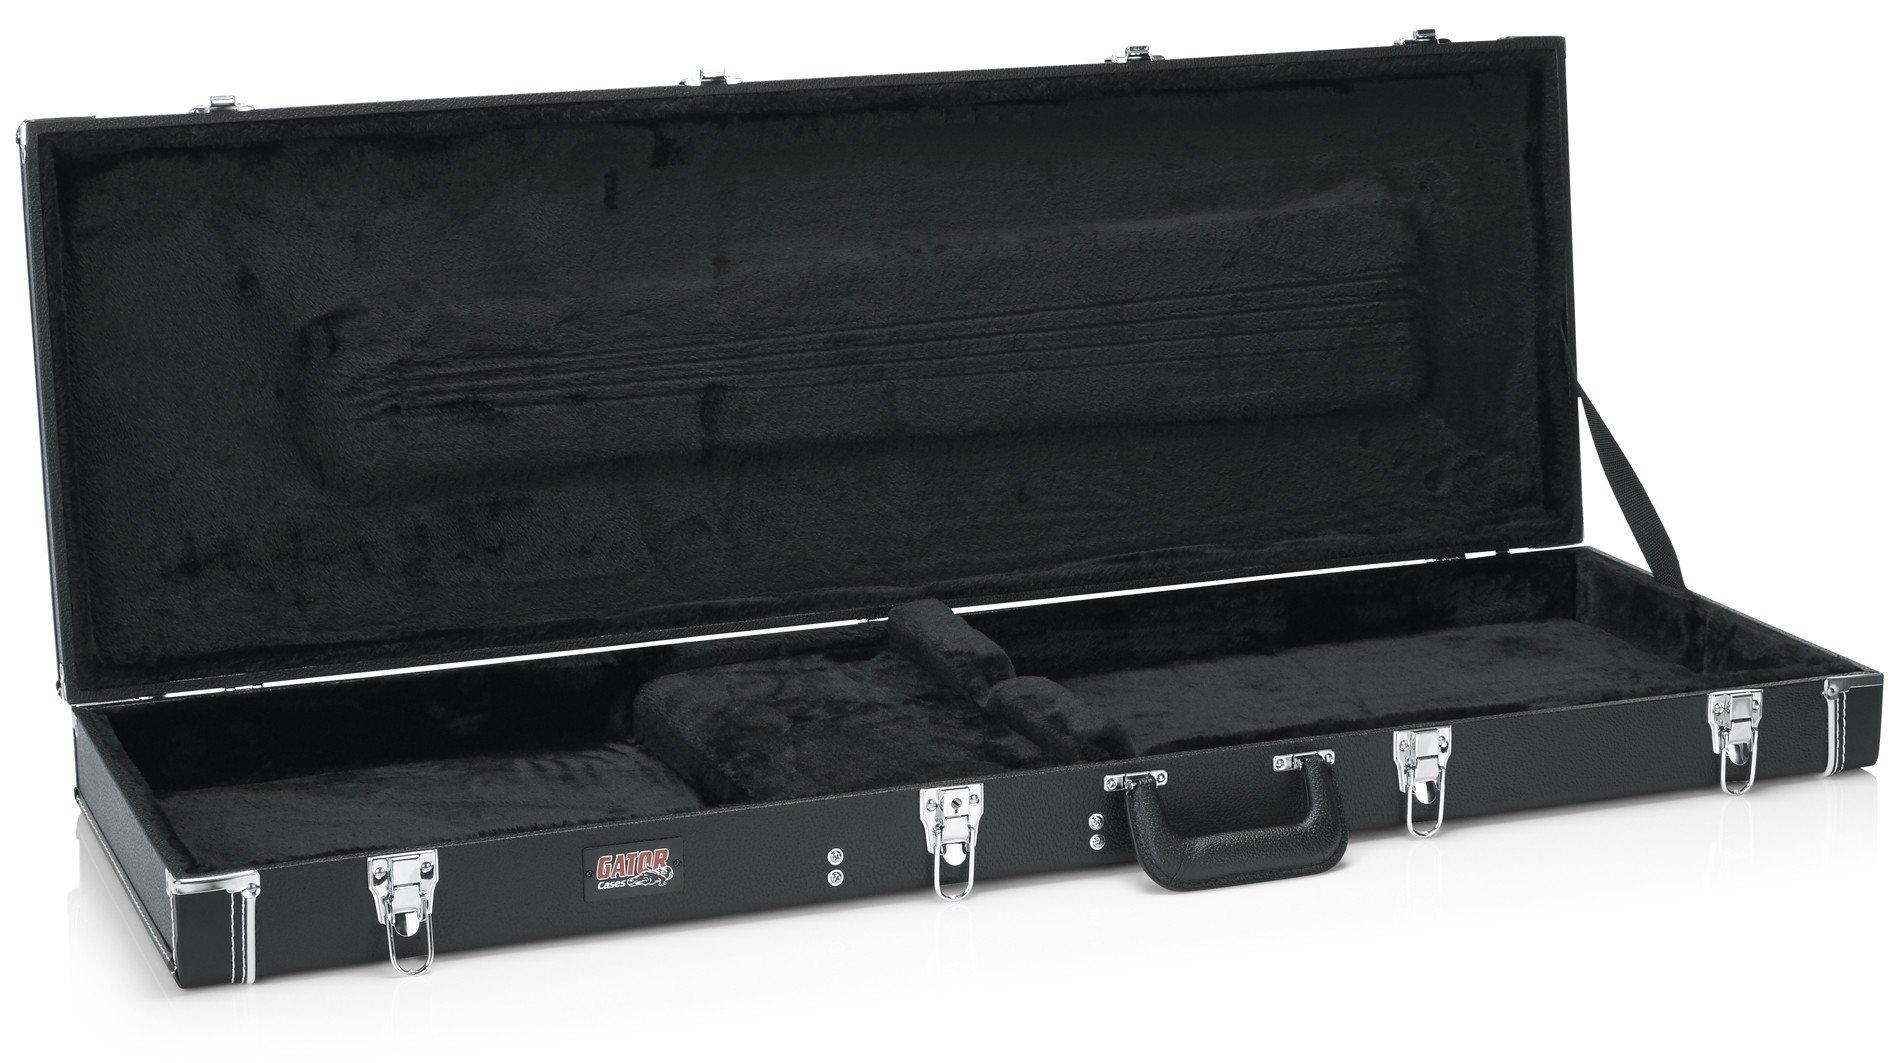 Gator GW-BASS Deluxe Wood Case for Bass Guitars